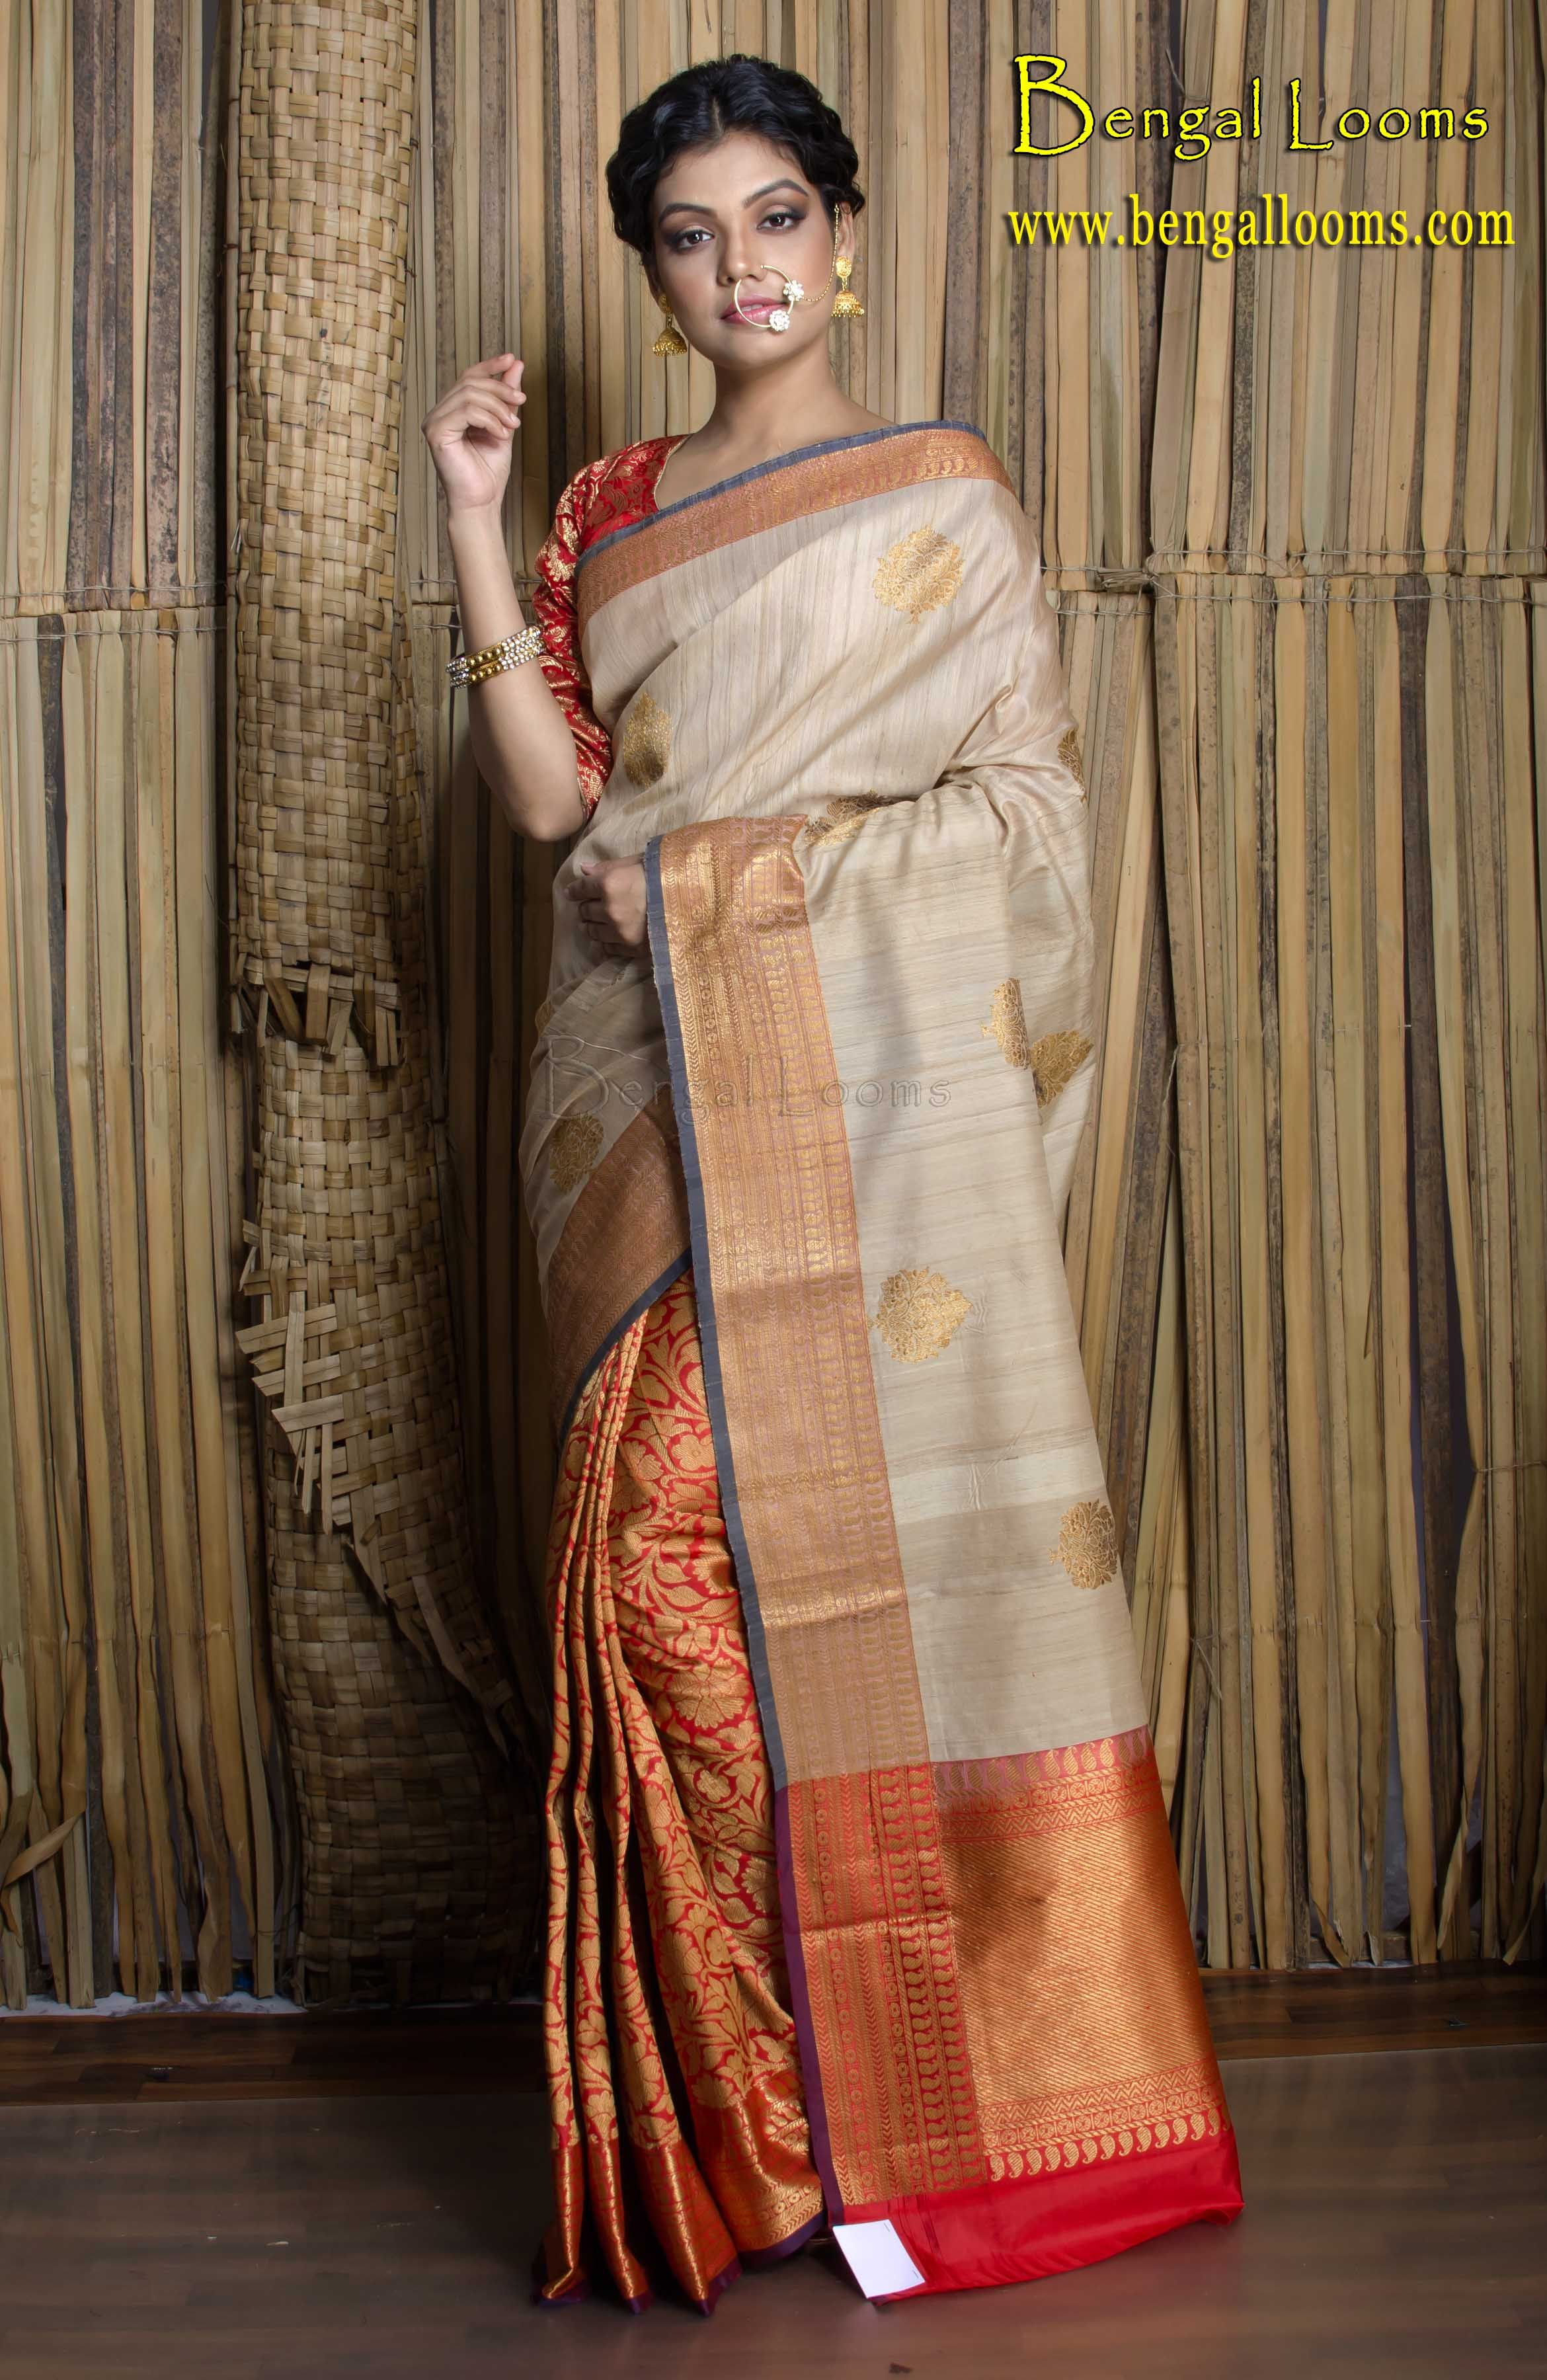 cbec07c69da56b Half Tussar and Half Brocade Silk Banarasi Saree in Beige and Red ...